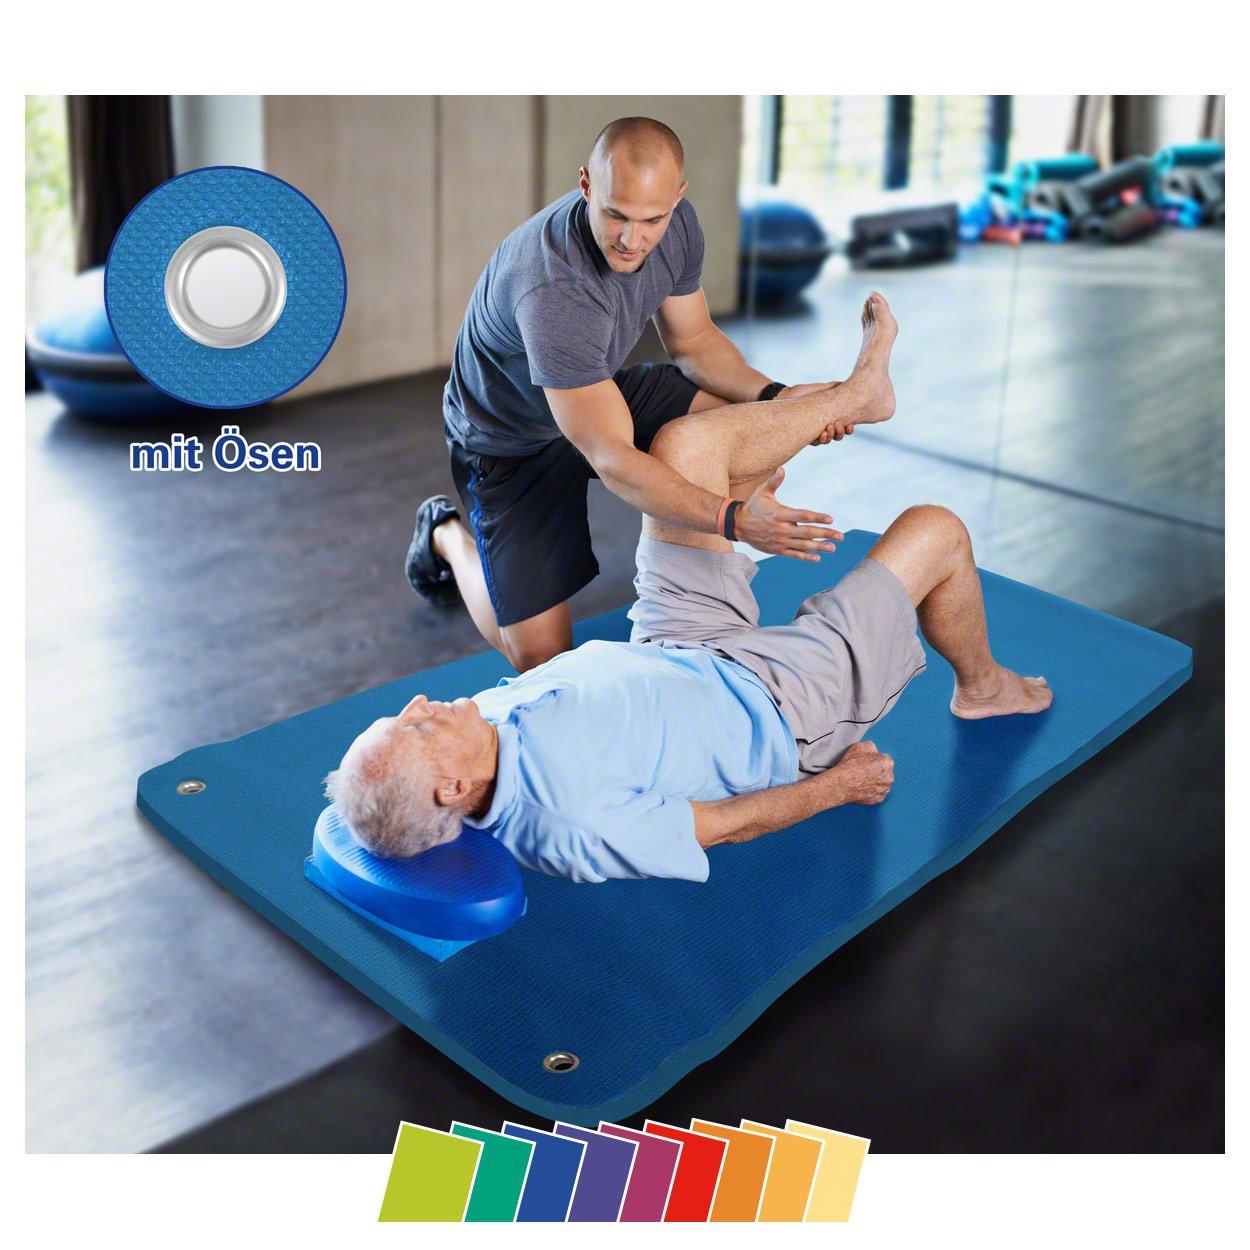 Sport-Tec Therapiematte inkl. Ösen, LxBxH 180x100x1,5 cm